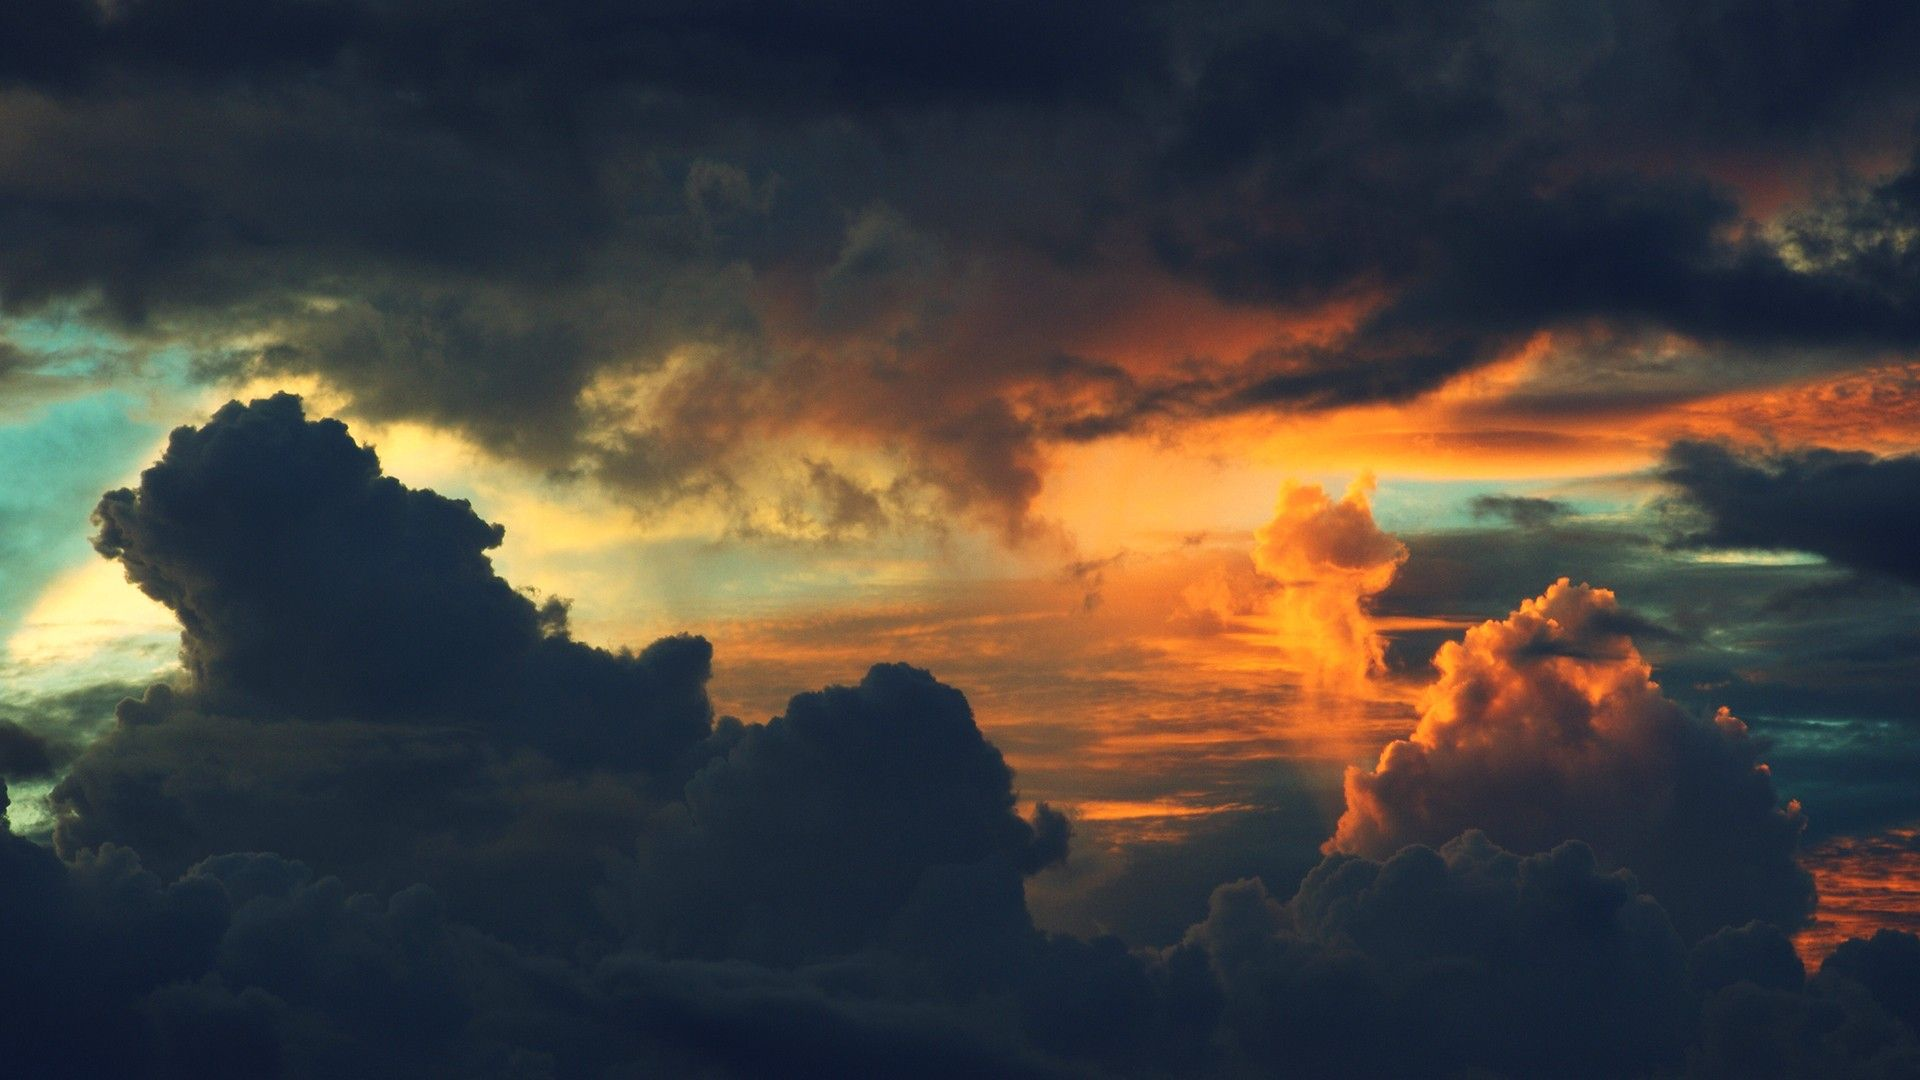 Dark Clouds image